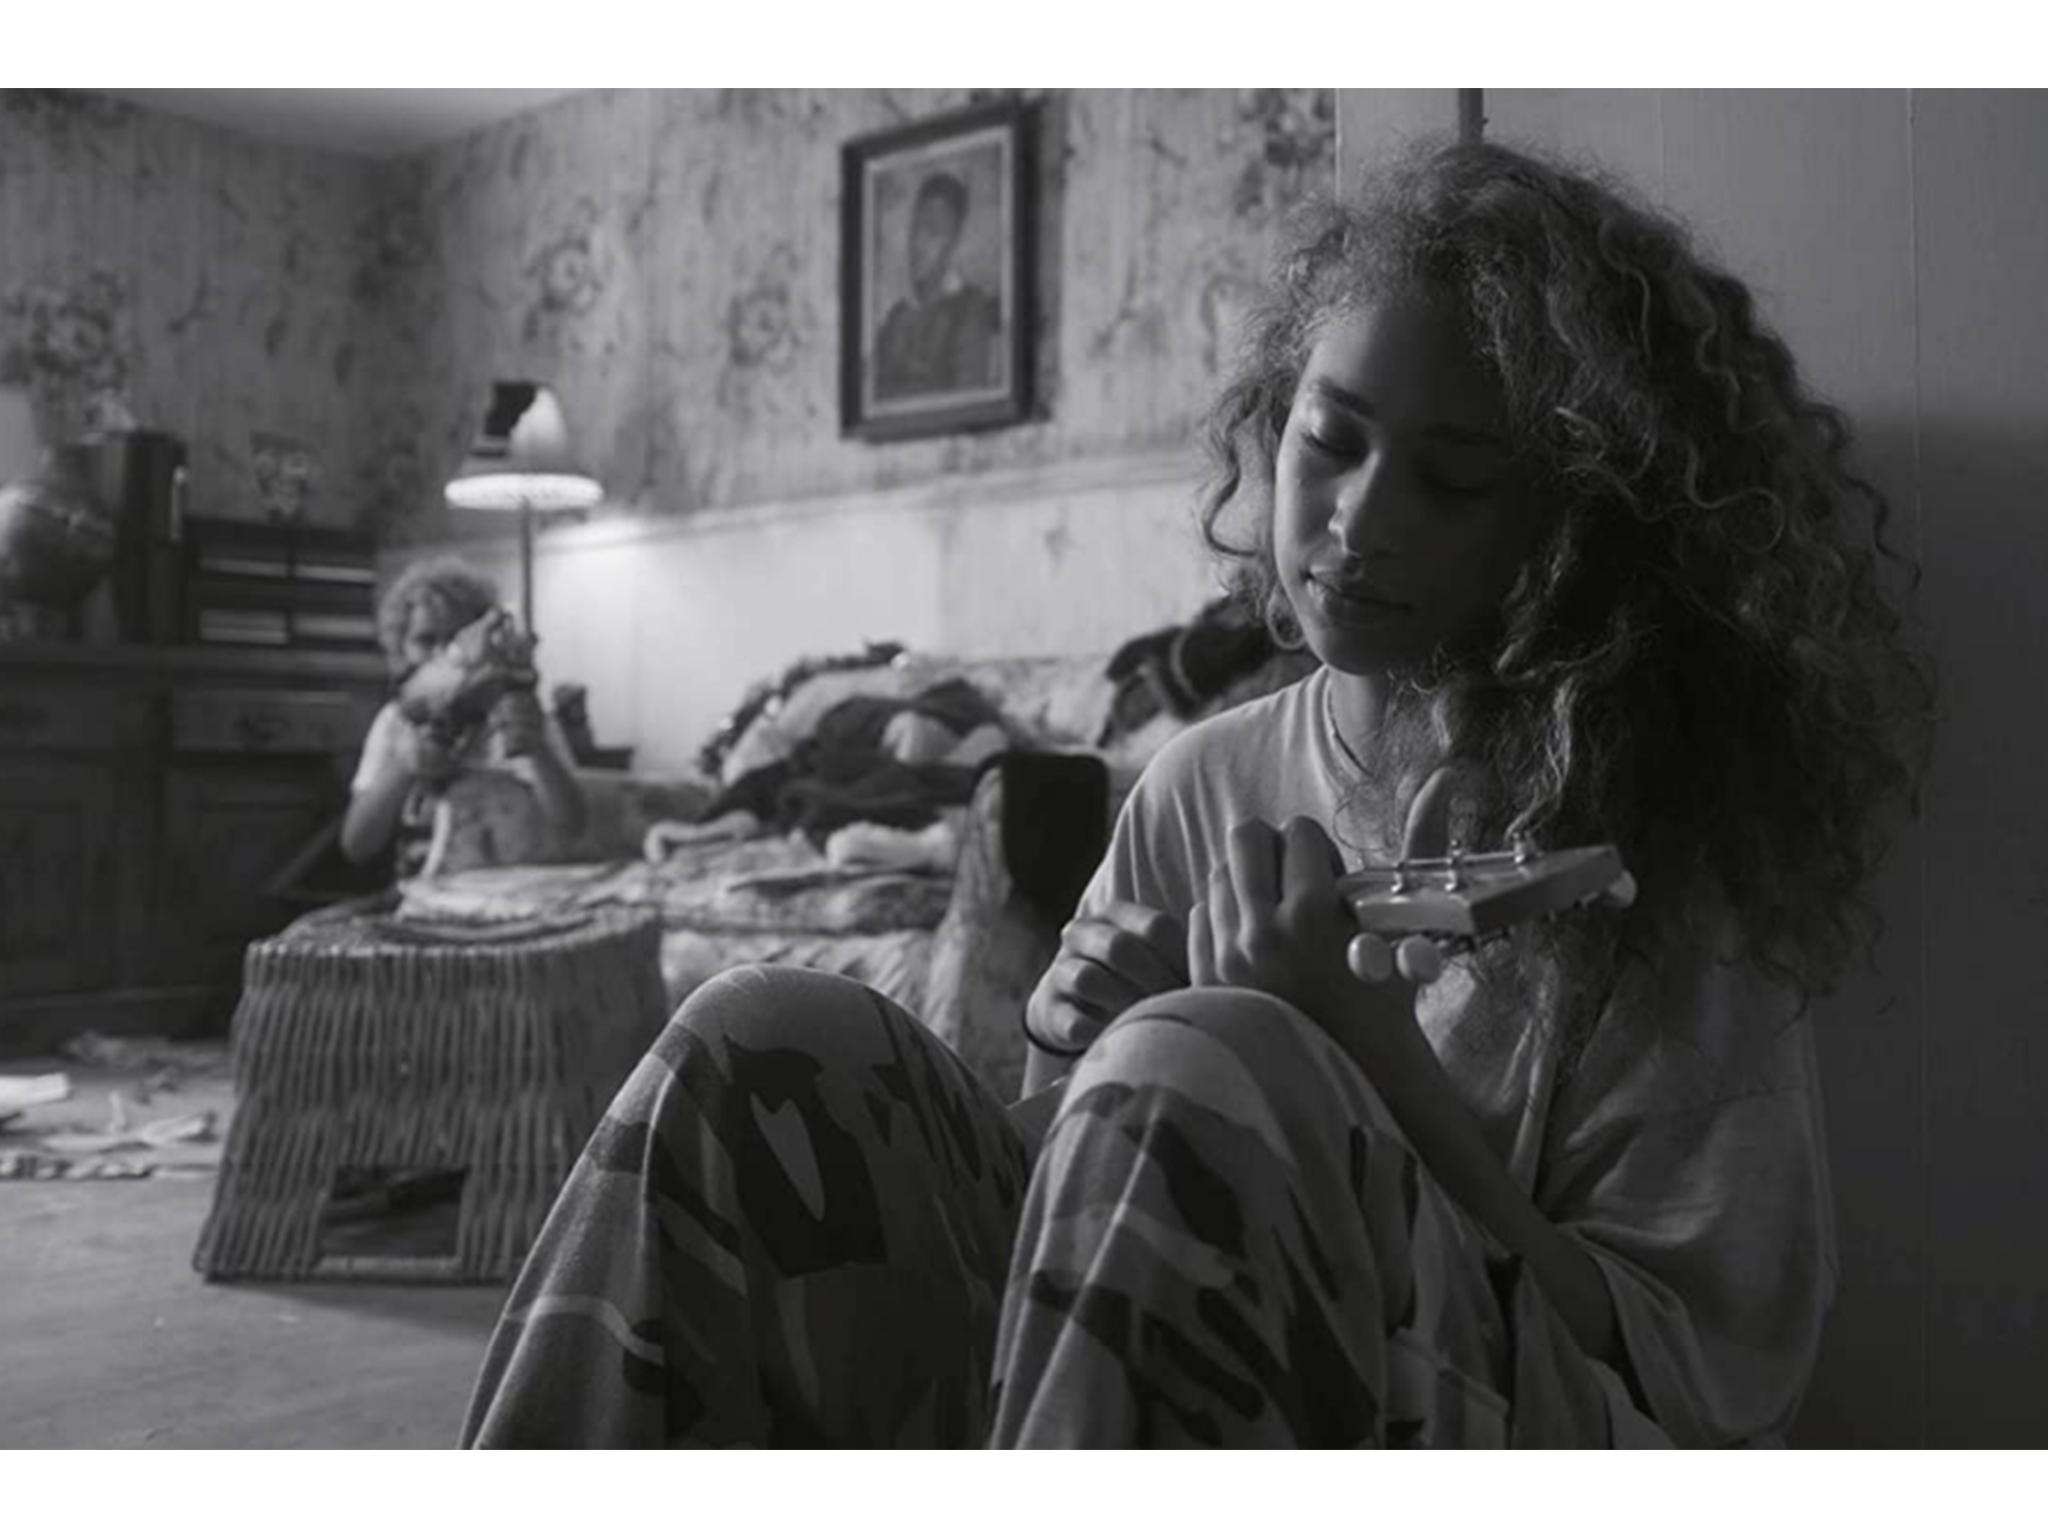 Filme, Cinema, Drama, Sweet Thing - Infância à Deriva (2020)